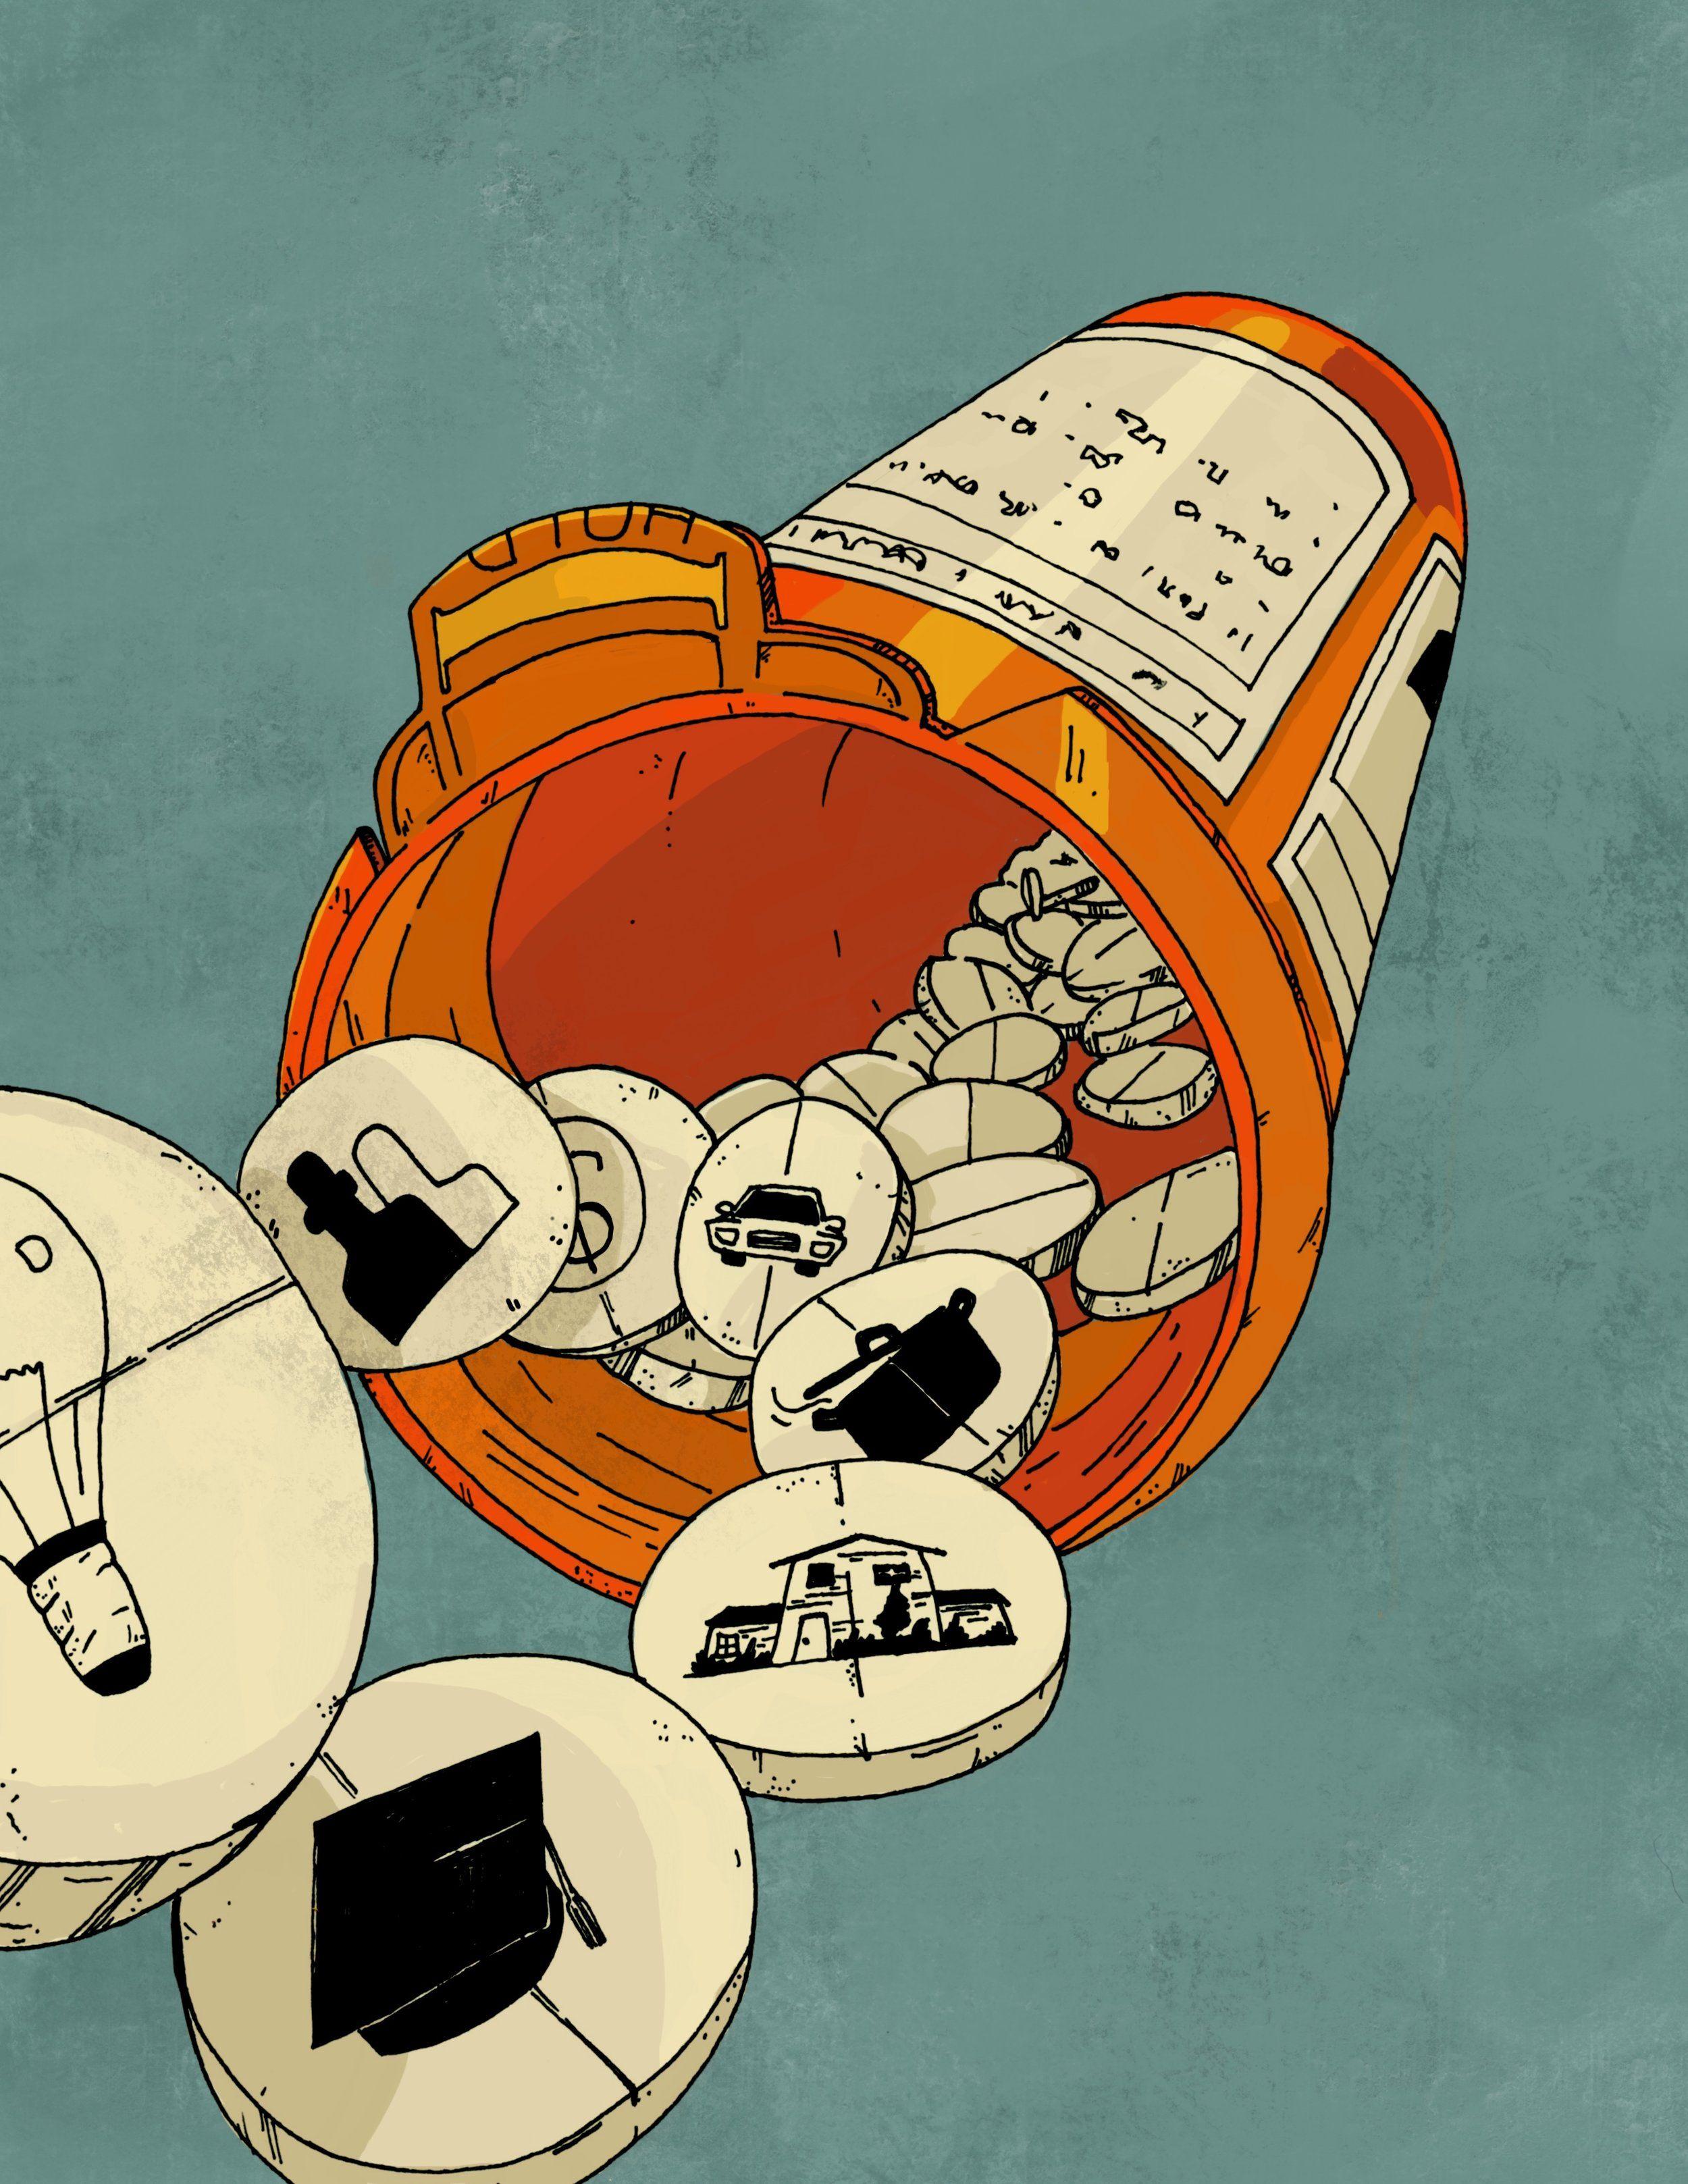 Social Determinants of Health | Social work practice, Illustrators,  Illustration